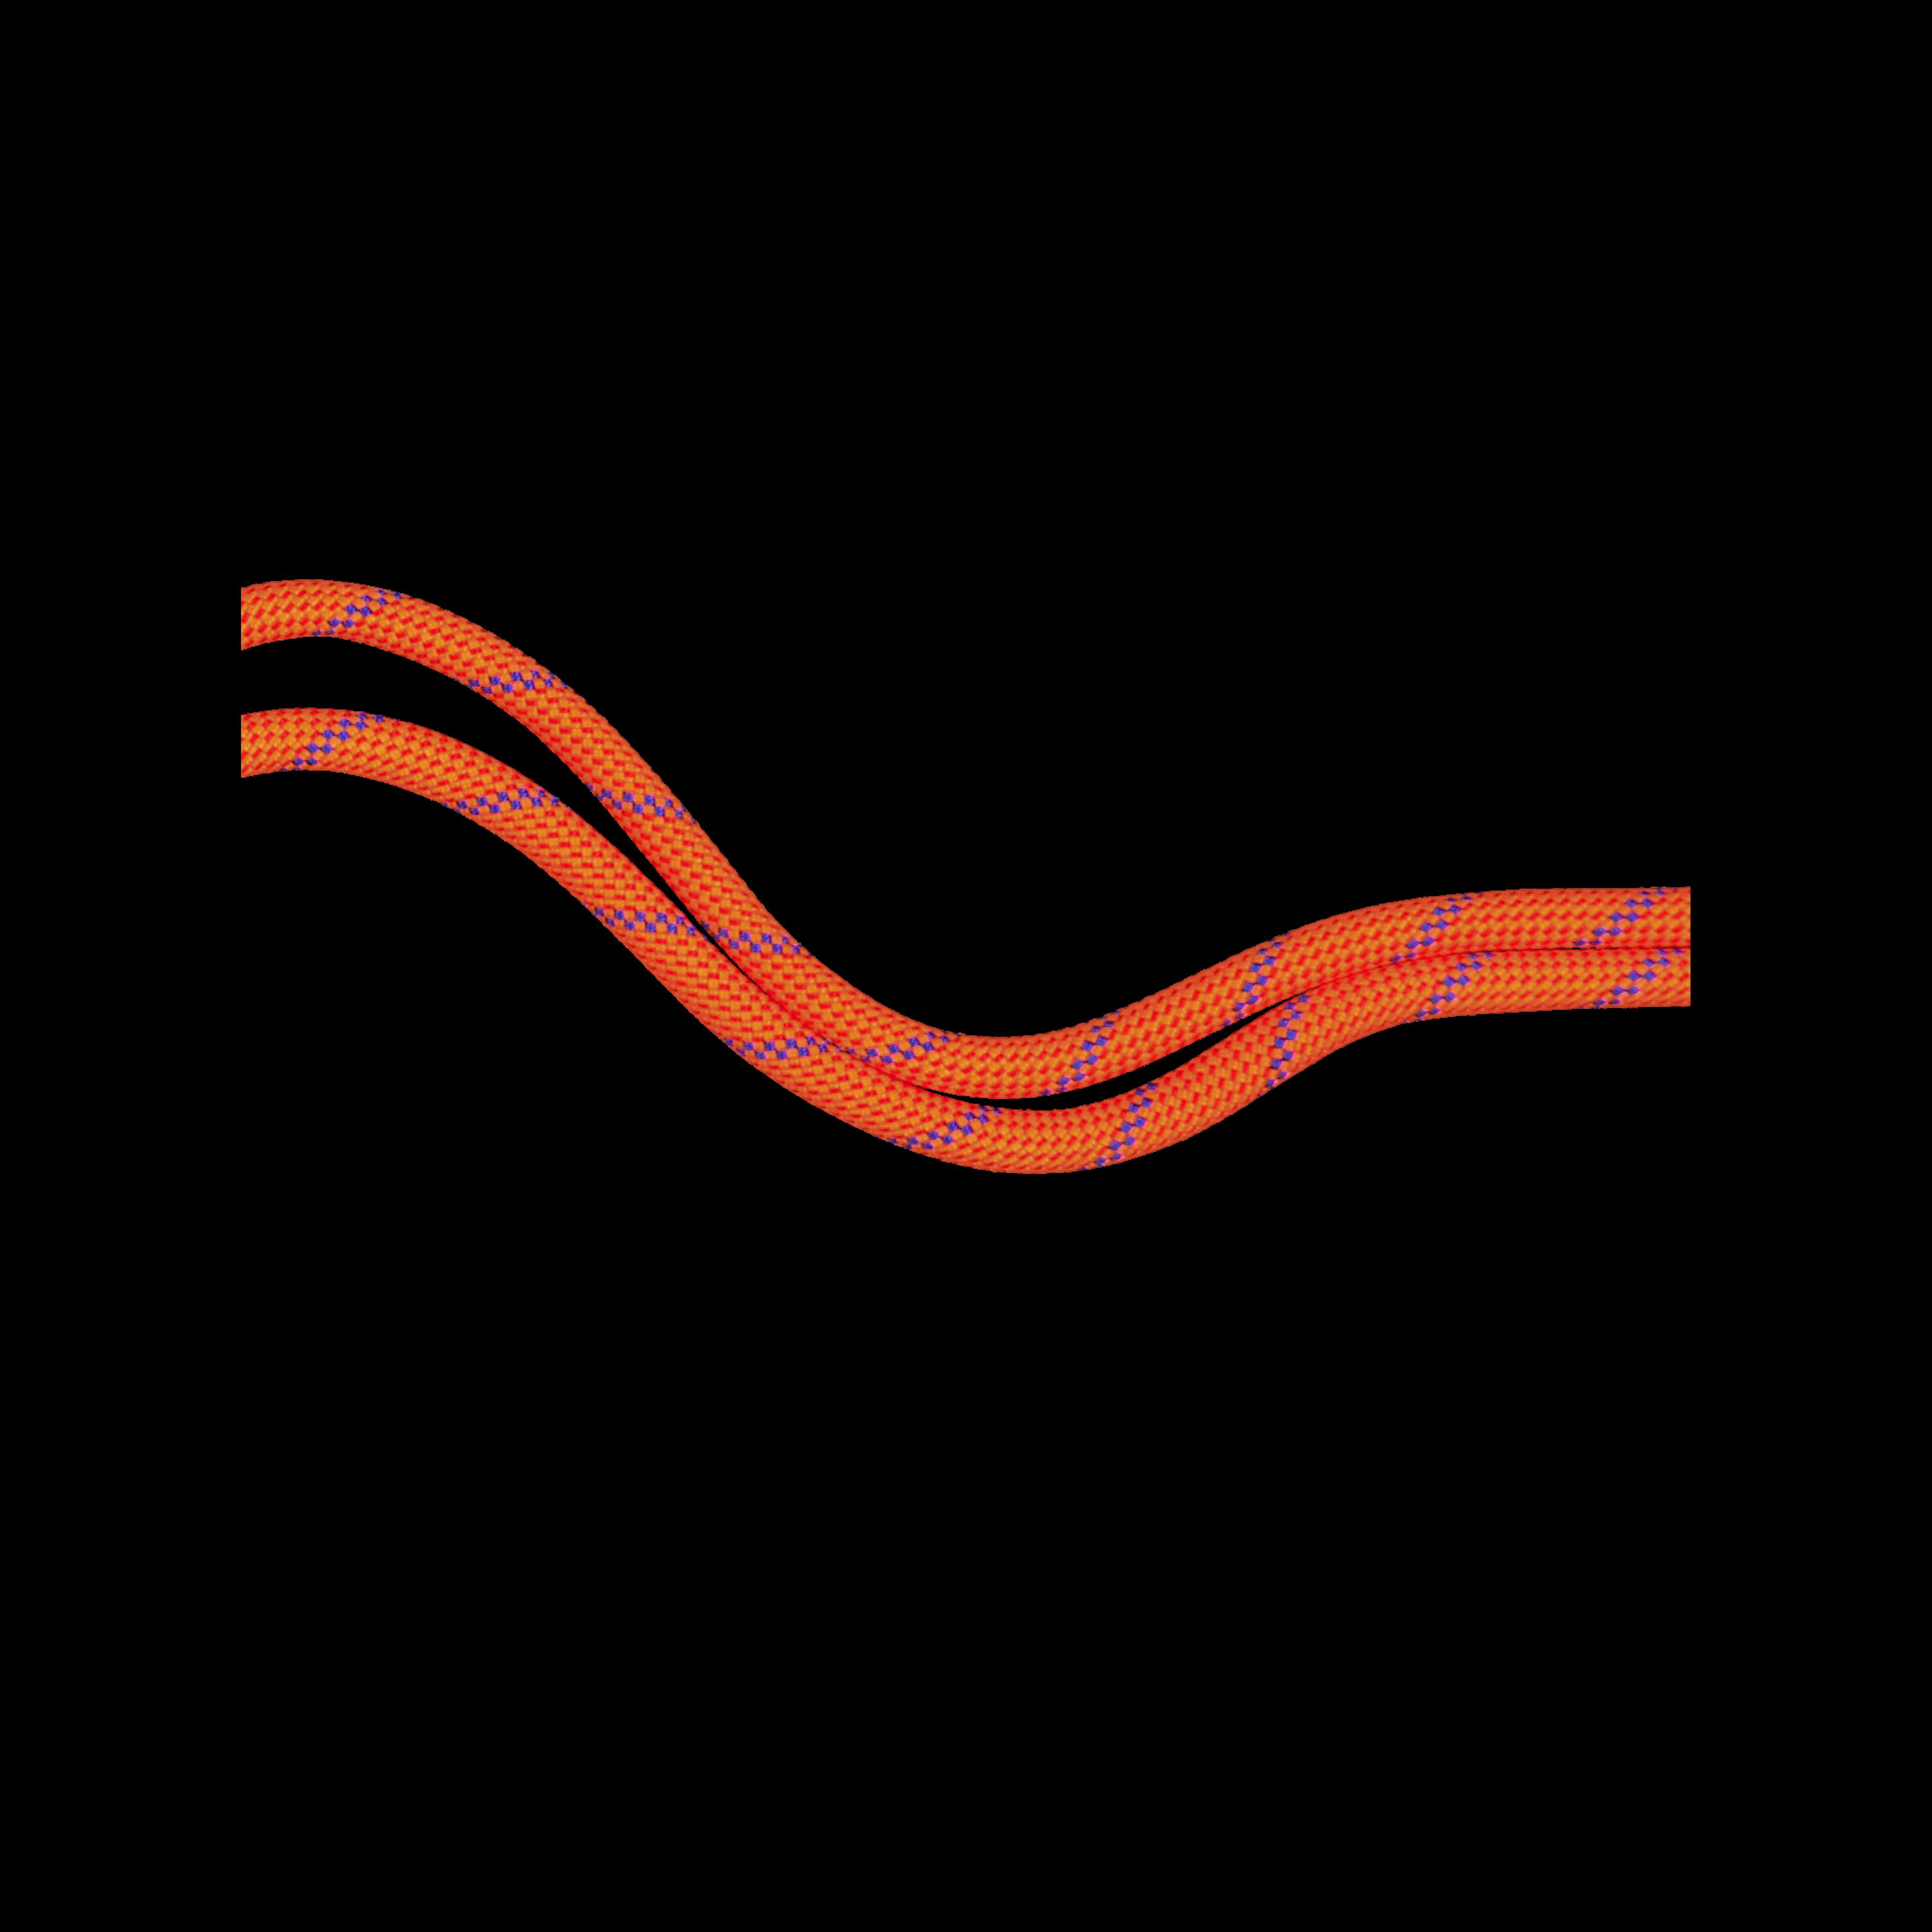 7.5 Alpine Sender Dry Rope product image